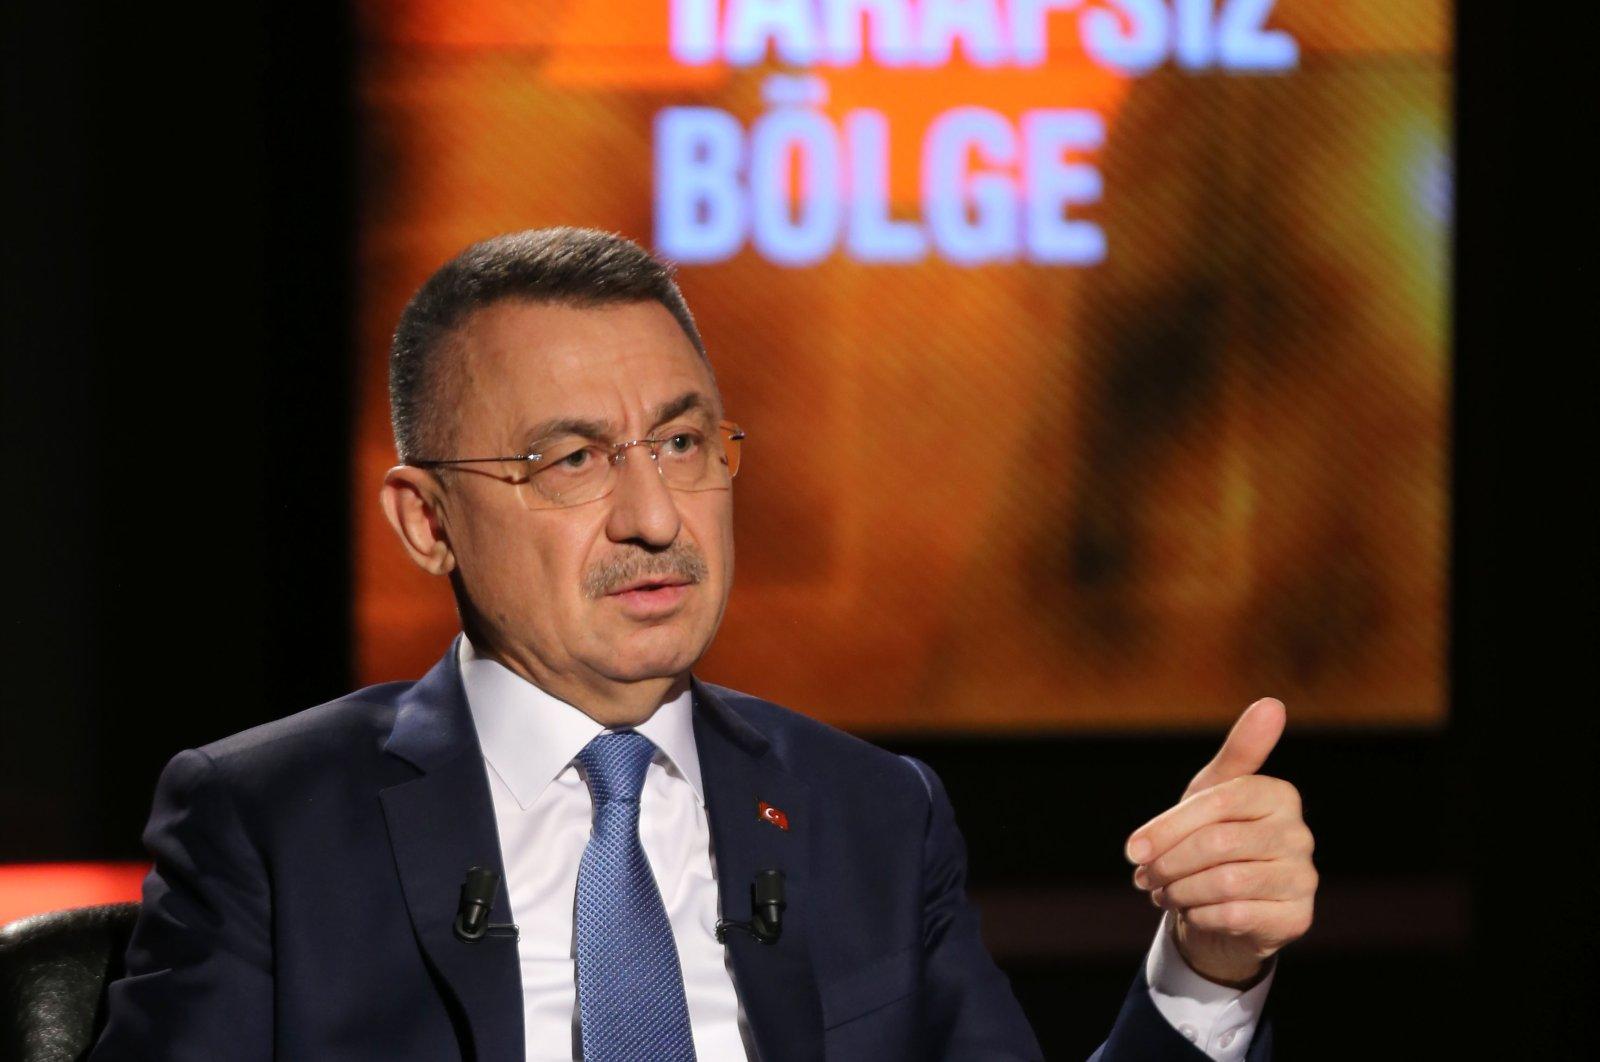 Vice President Fuat Oktay speaks during the CNN Türk broadcast in Ankara, Turkey, Oct. 21, 2020 (AA Photo)